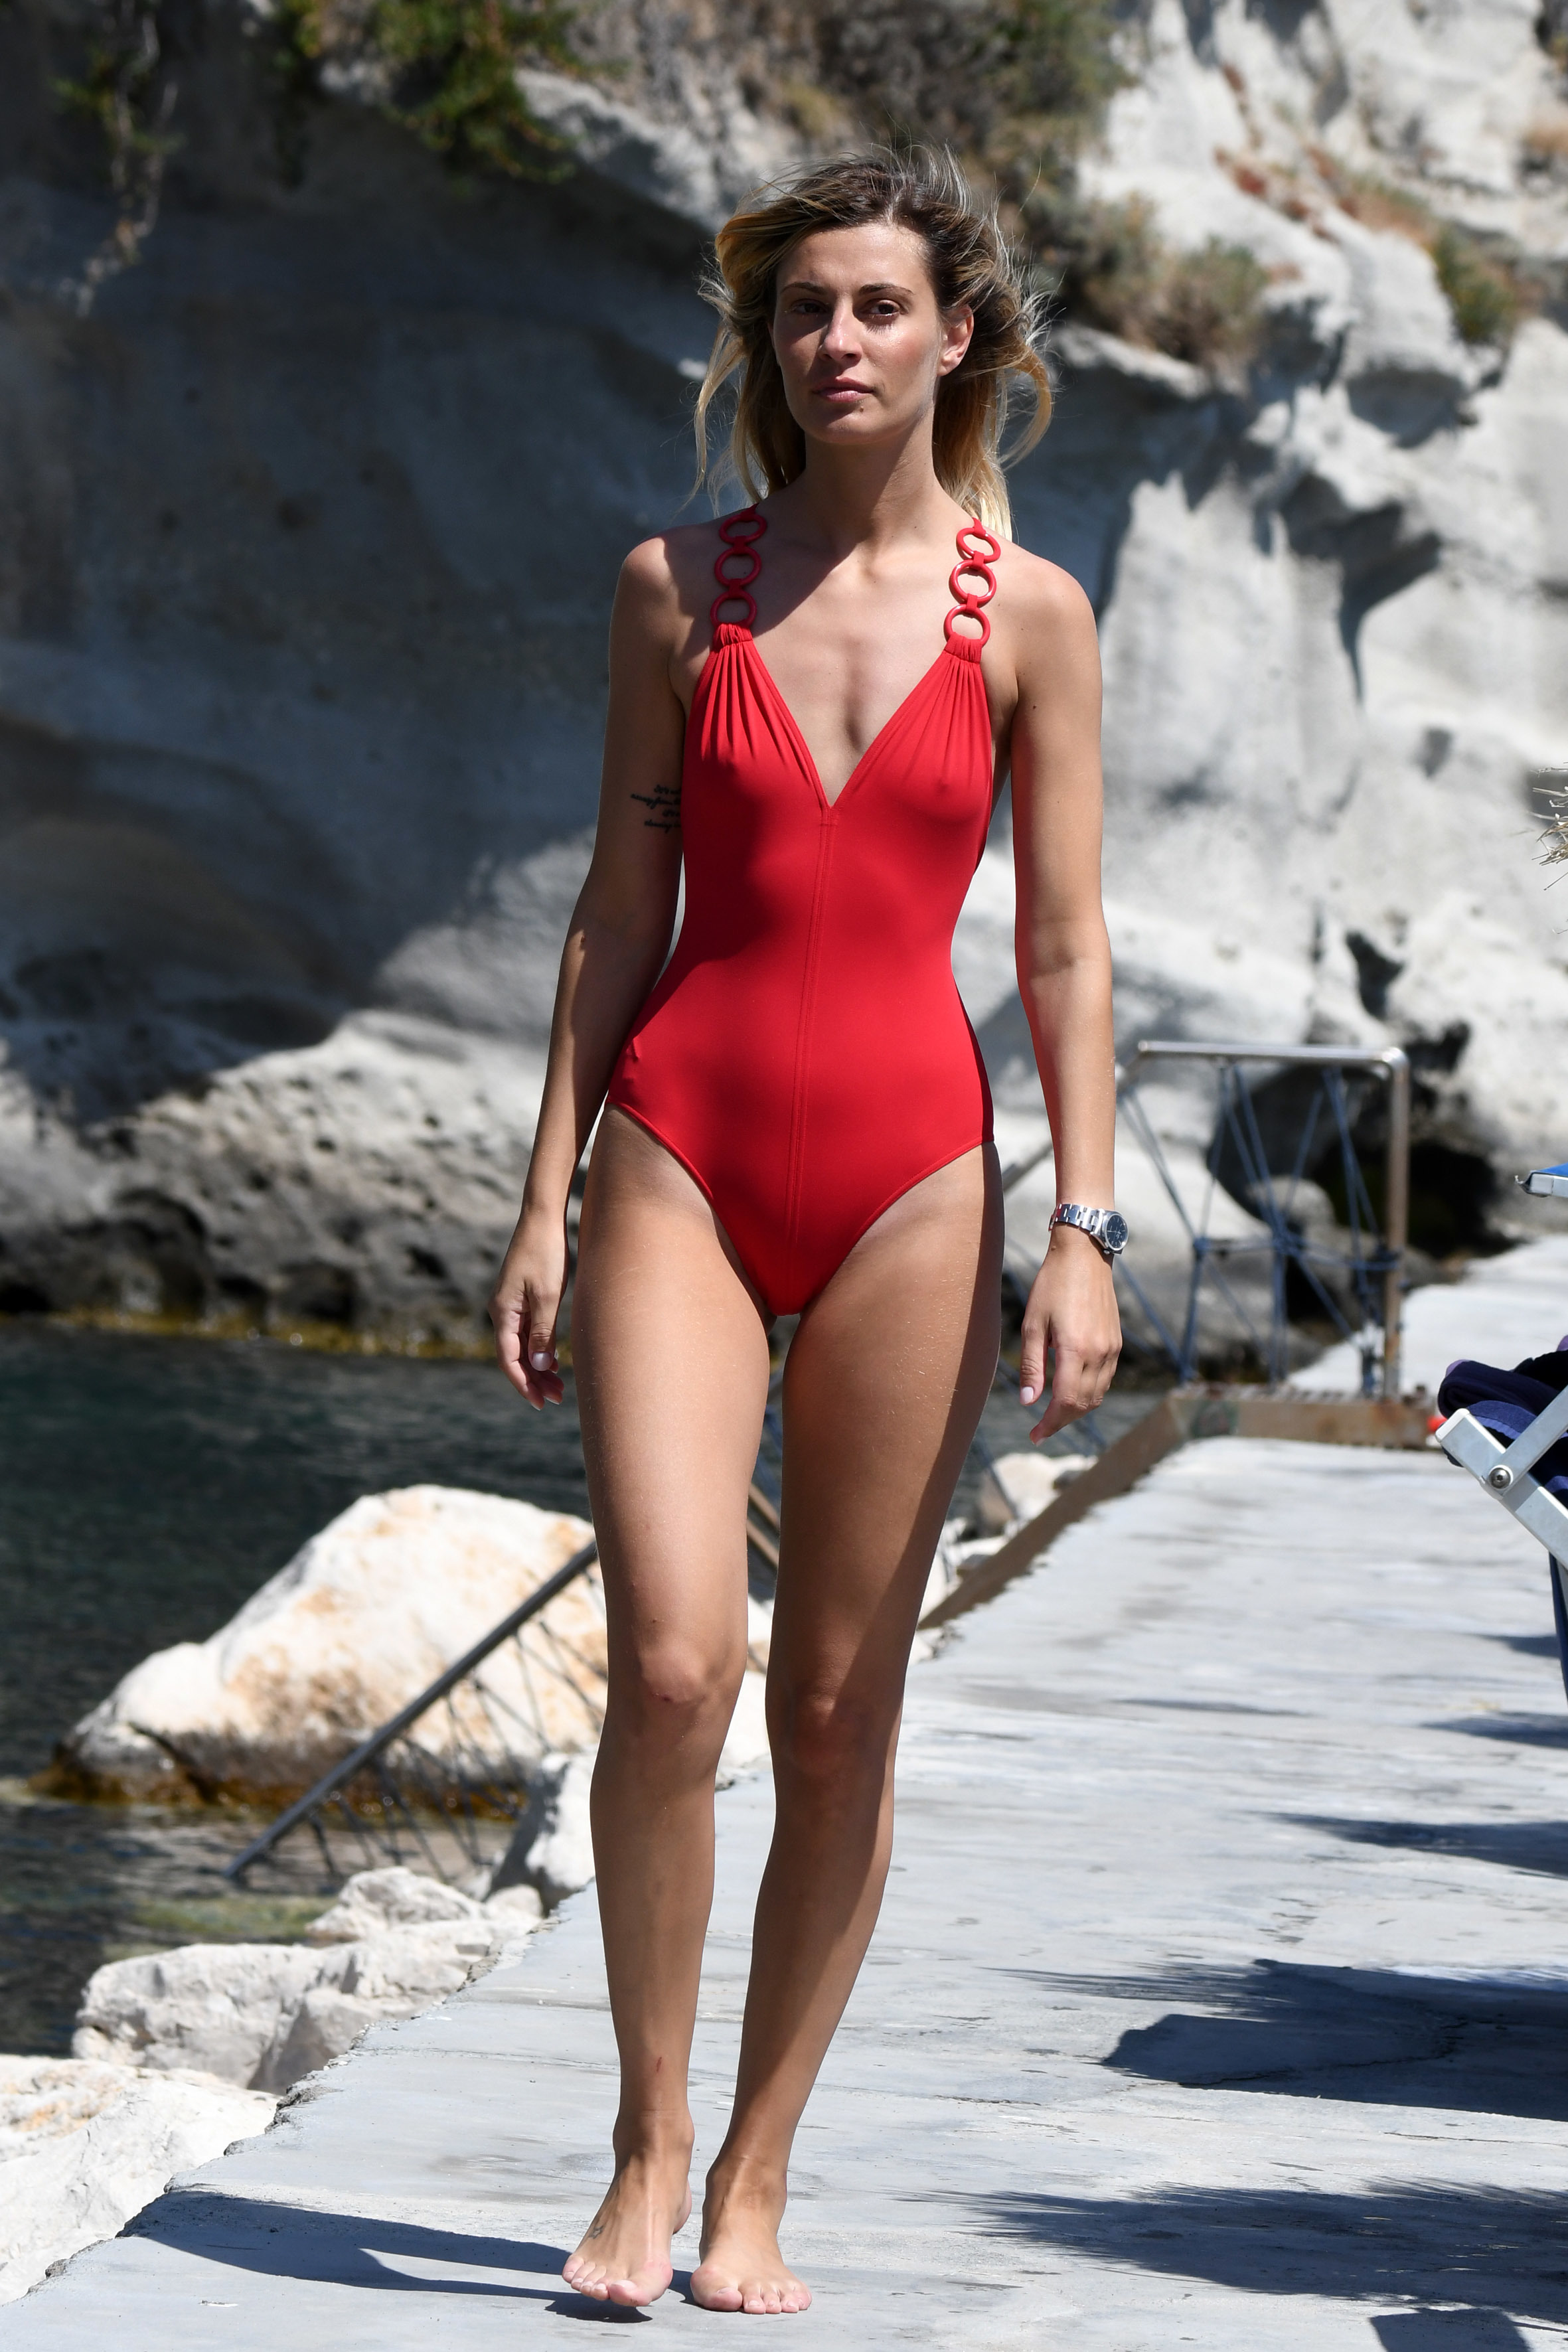 Sveva Alviti nude (58 foto and video), Pussy, Paparazzi, Feet, braless 2020